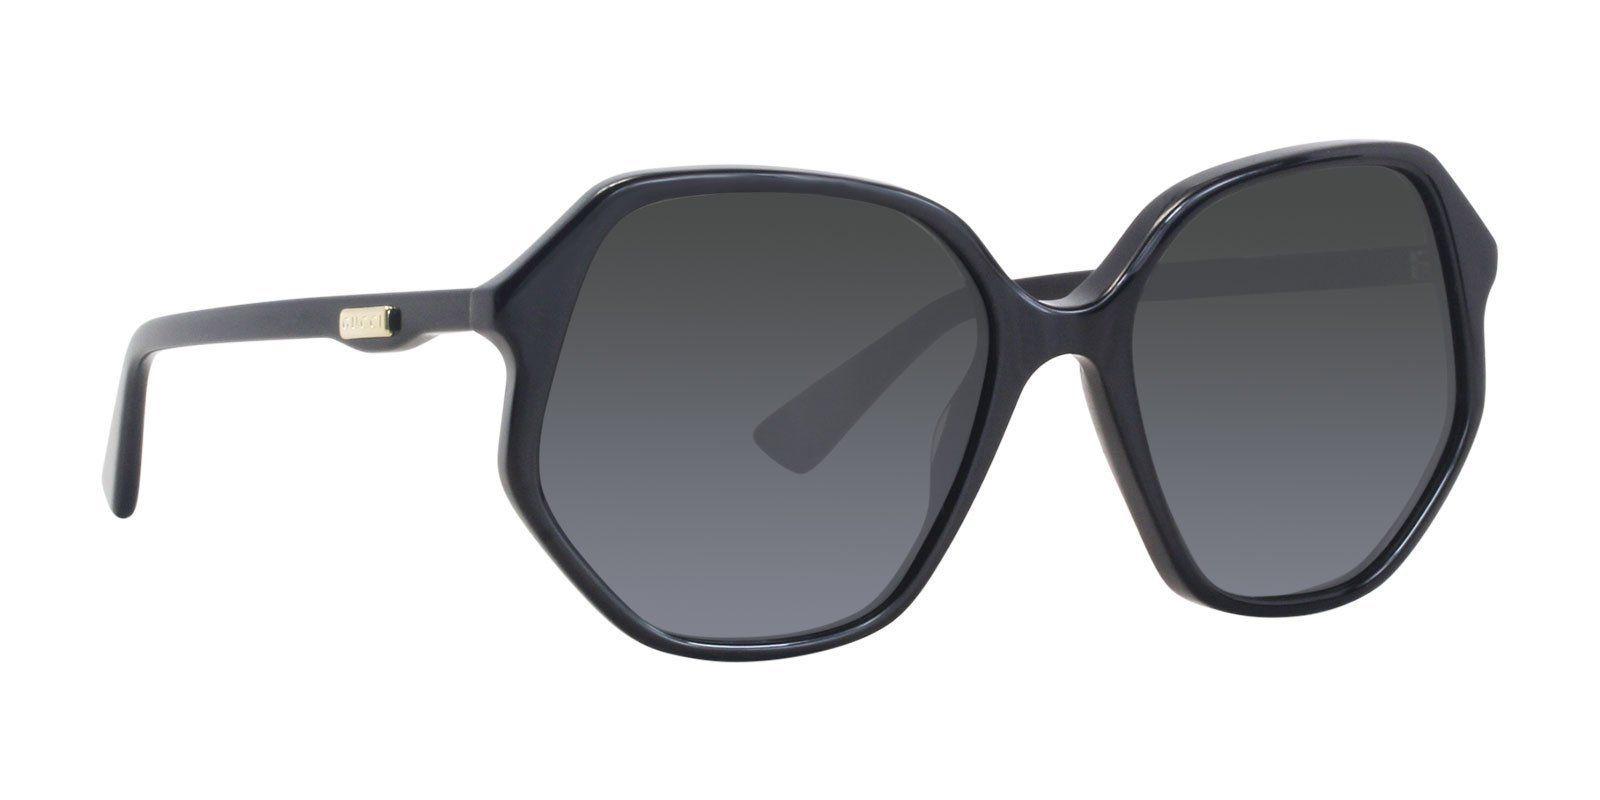 6d1abe700c2 Gucci - GG0258S 001-sunglasses-Designer Eyes